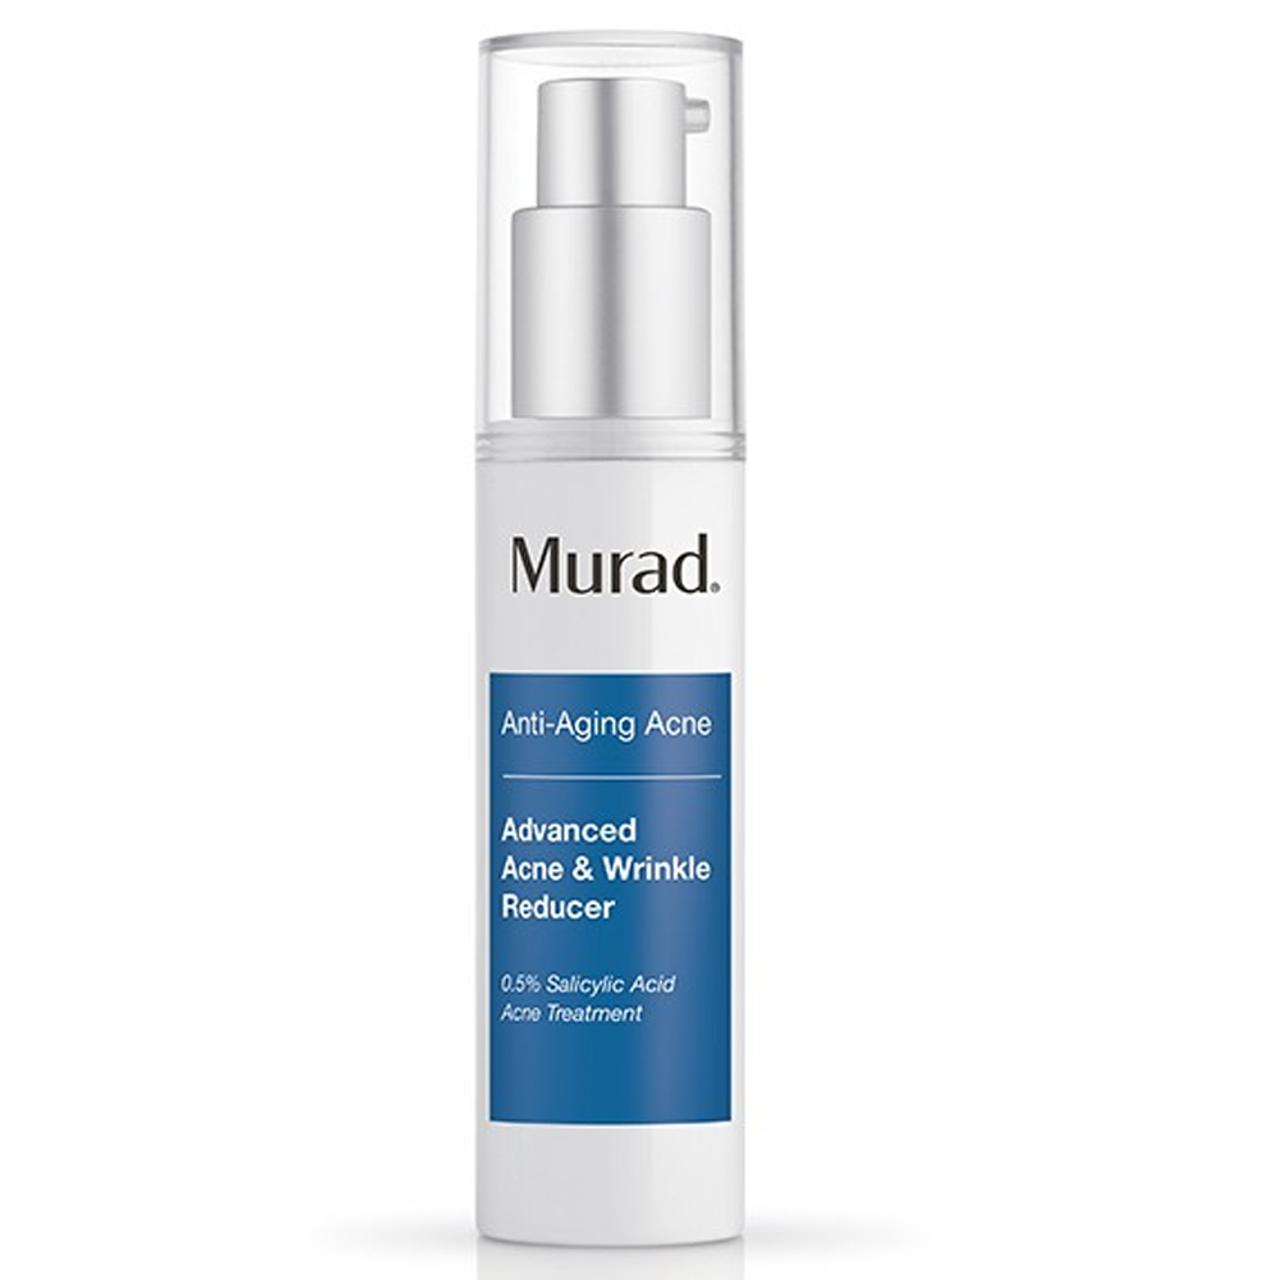 Murad Advanced Acne & Wrinkle Reducer 1.0 oz